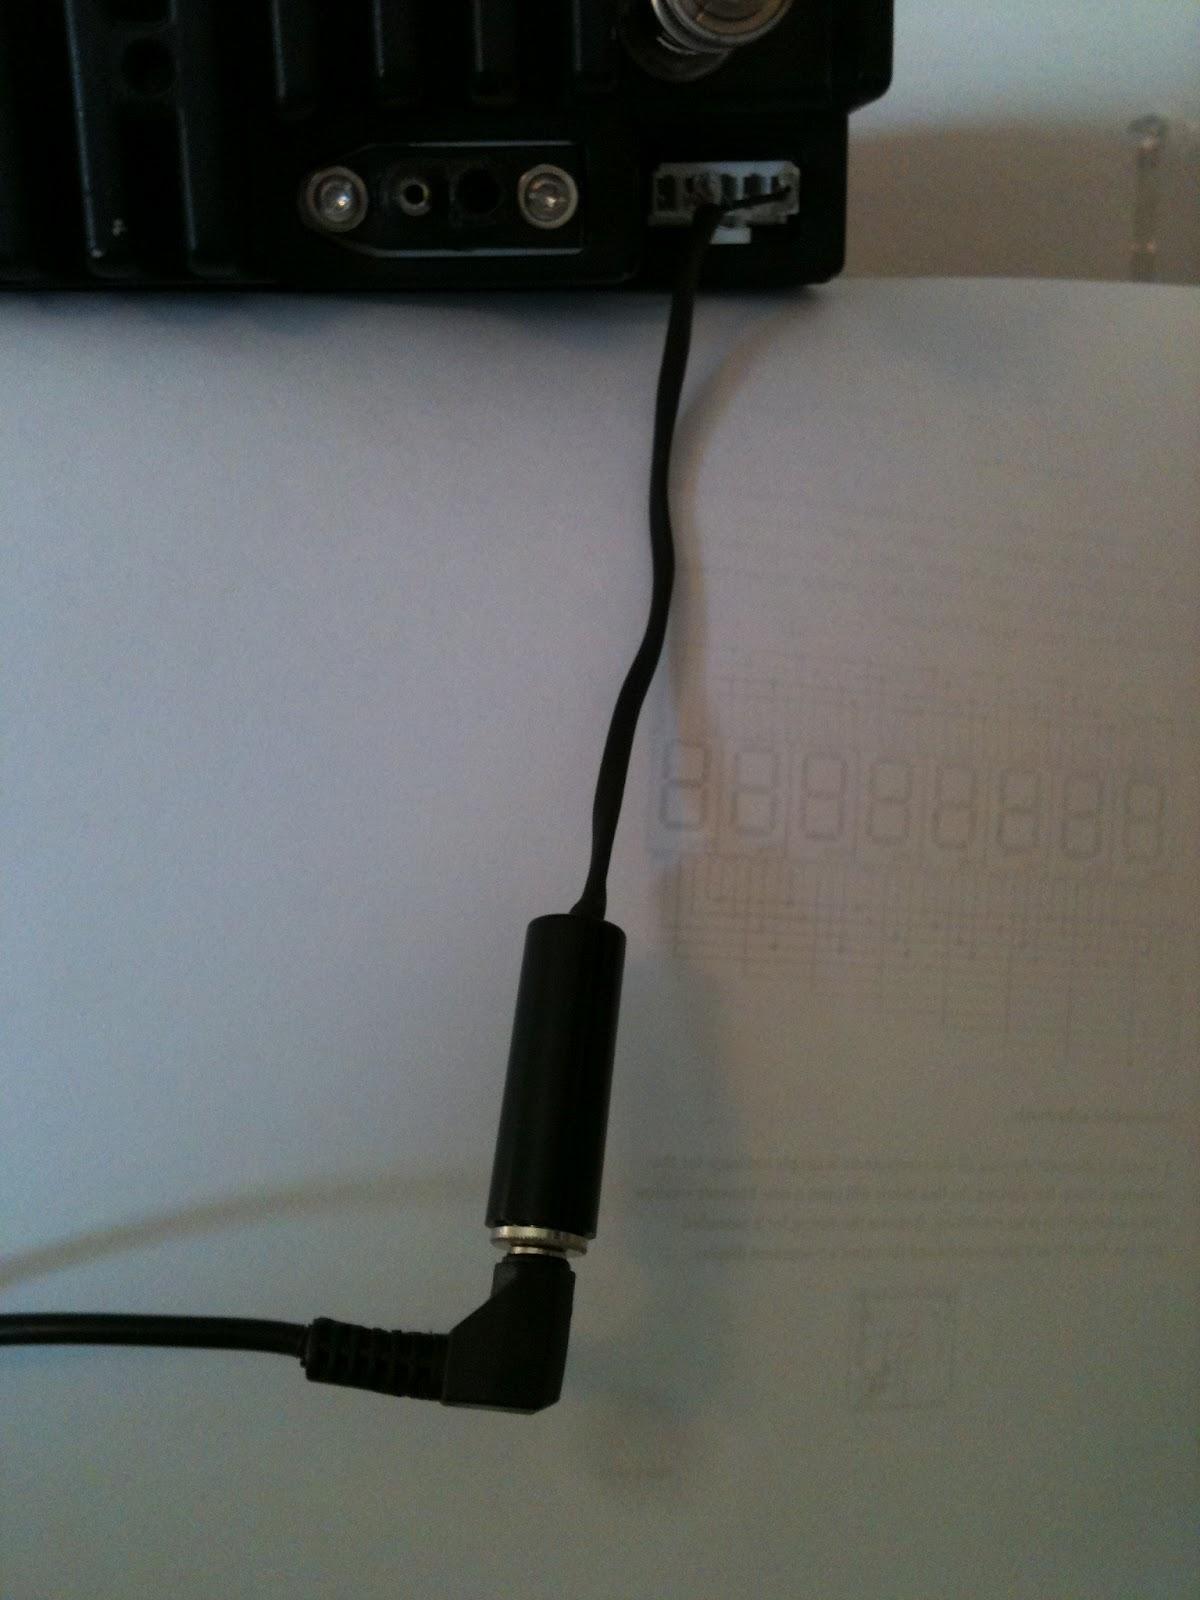 Utah Radio: Motorola Maxtrac 5-pin Accessory Jack